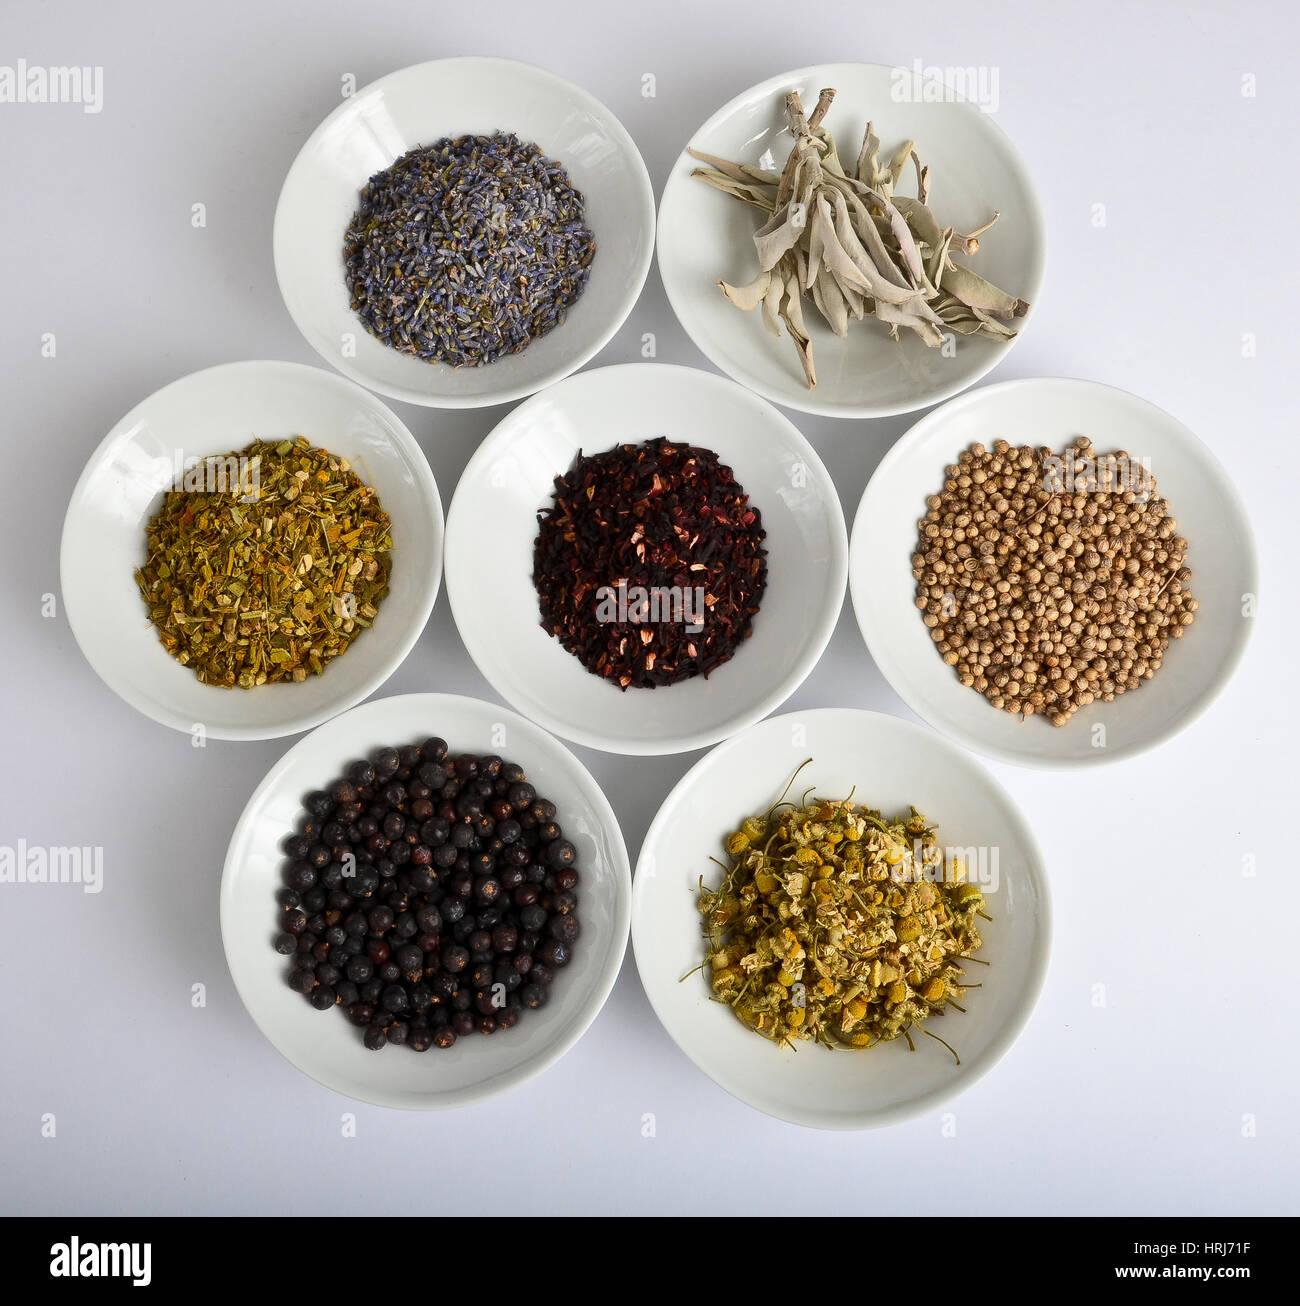 Medicinal Herbs - Stock Image